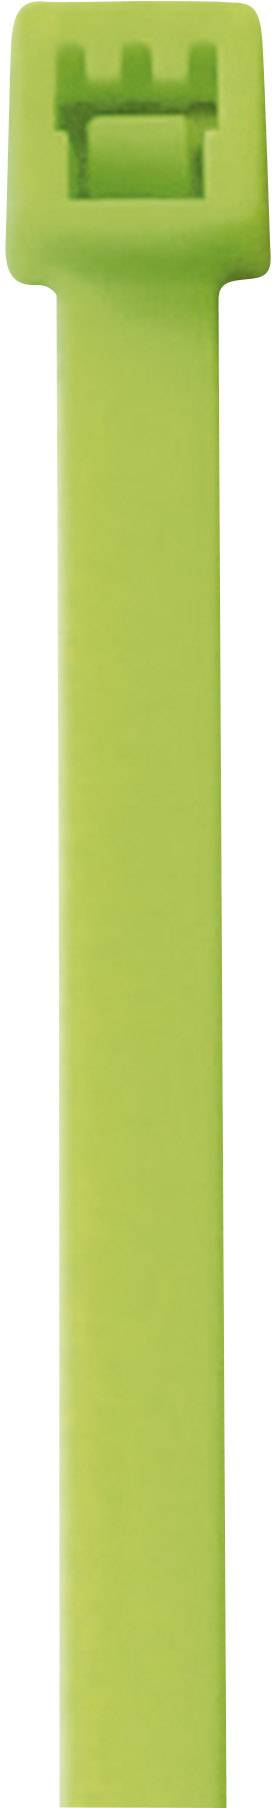 Neonska kabelska vezica, fluorescenčna (D x Š) 285 mm x 4.6 mm zelena, 50 kosov, PB Fastener